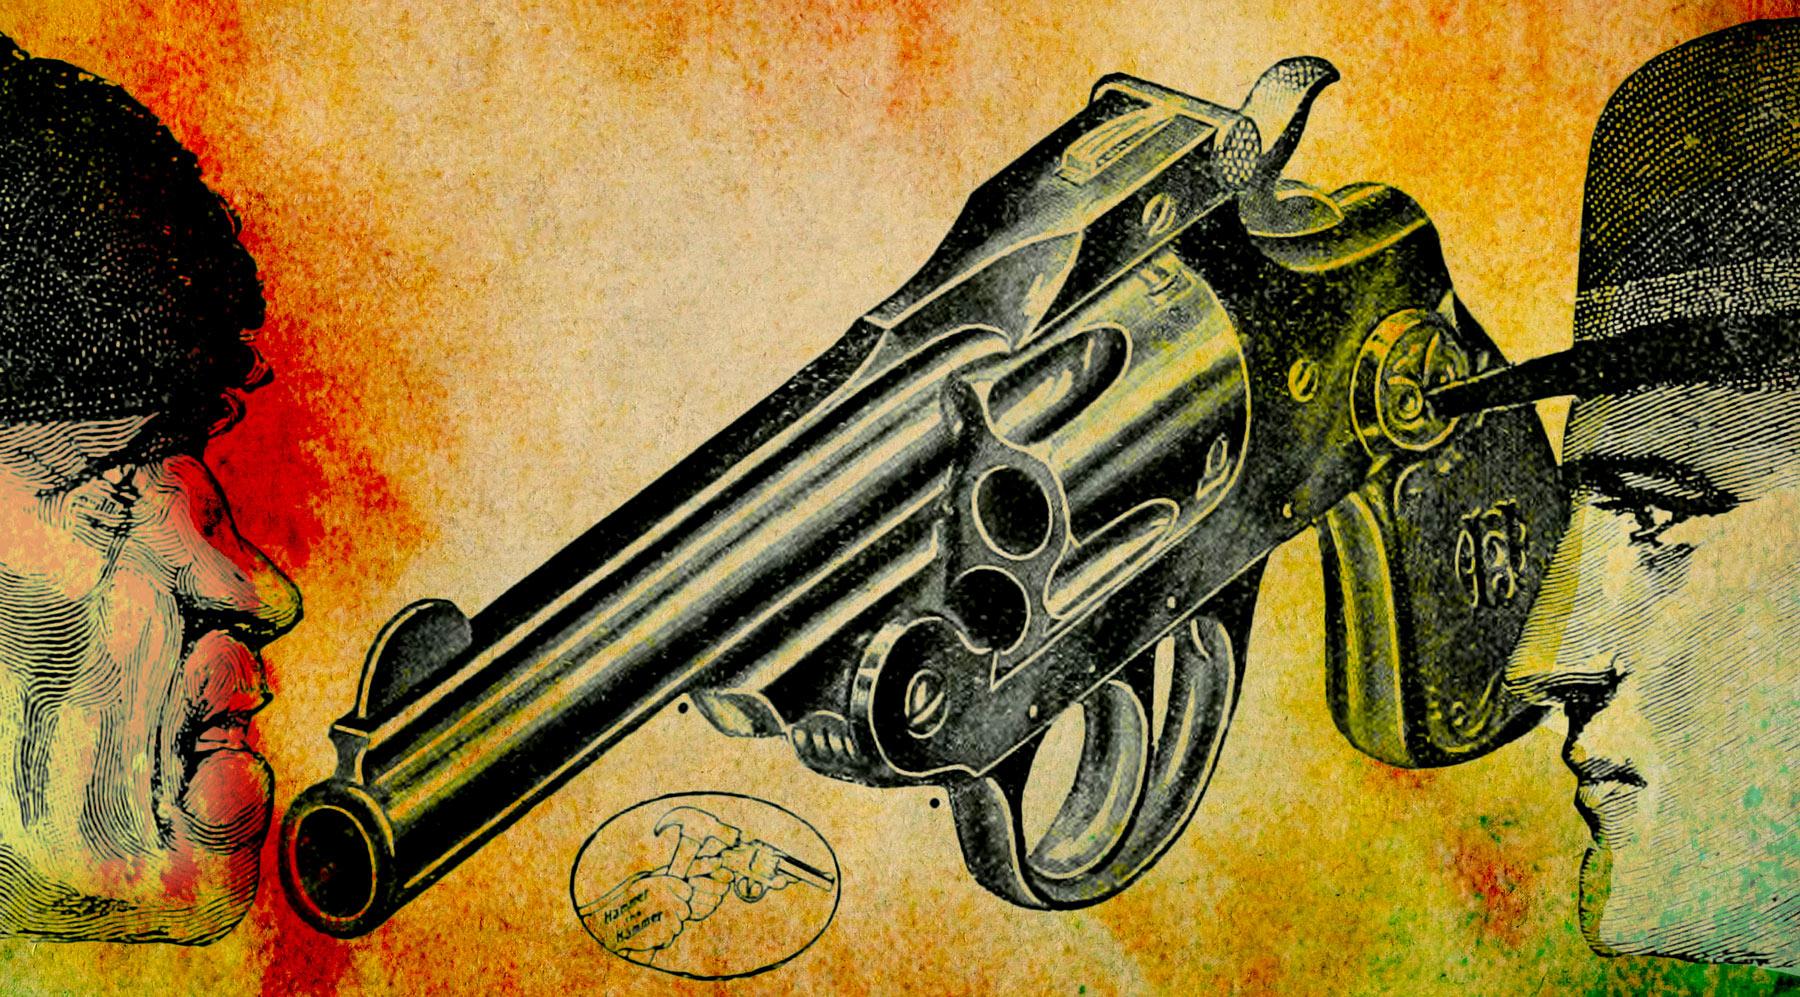 self defense, gun, responsibility, terrorism, collage, photomontage, JGill, Paul Jacob, Common Sense